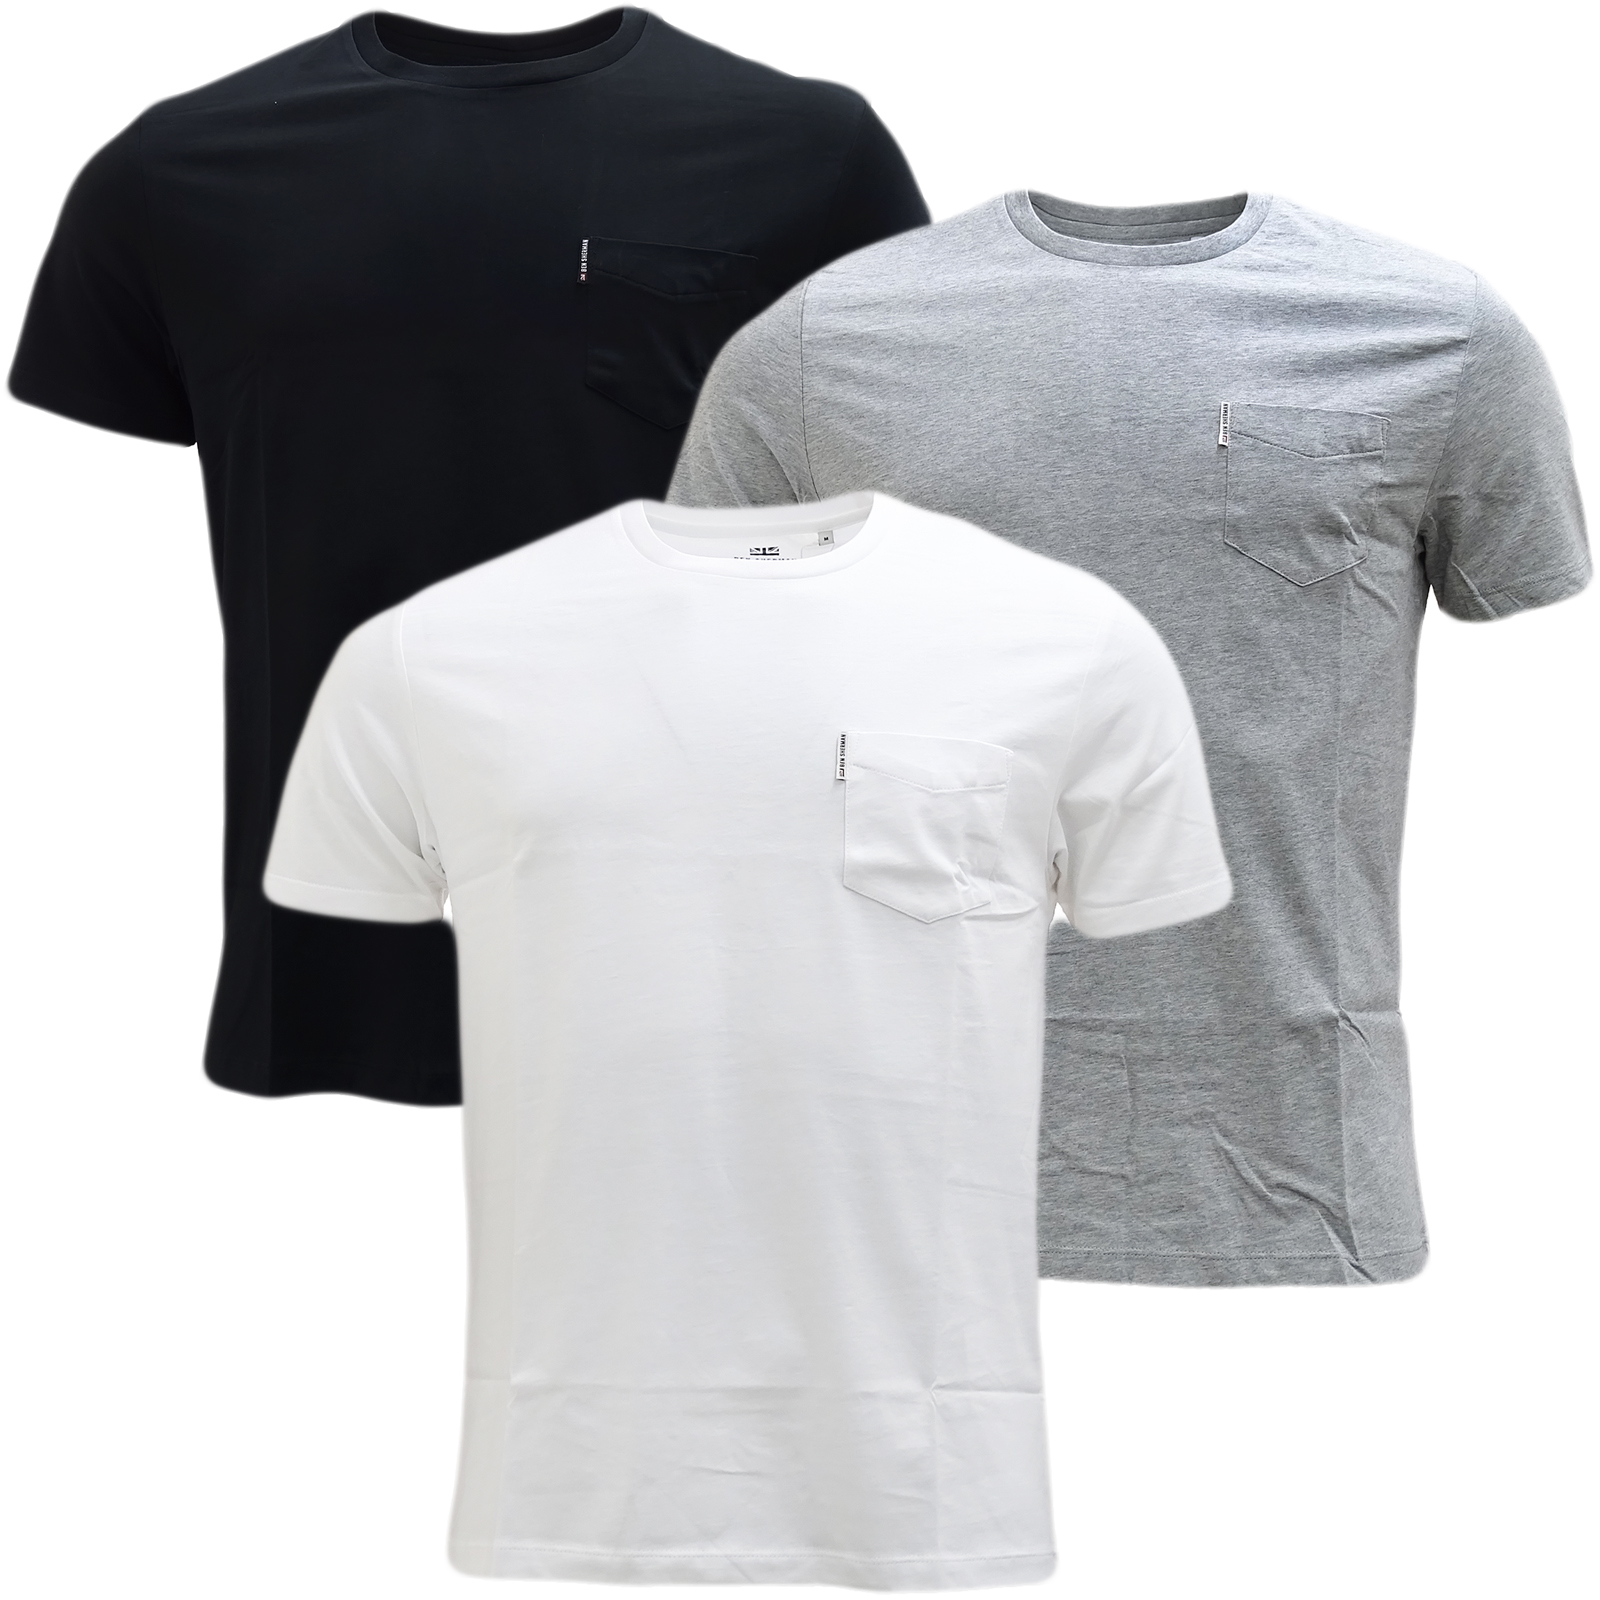 Ben Sherman Plain Pocket Chest T-Shirt 47843